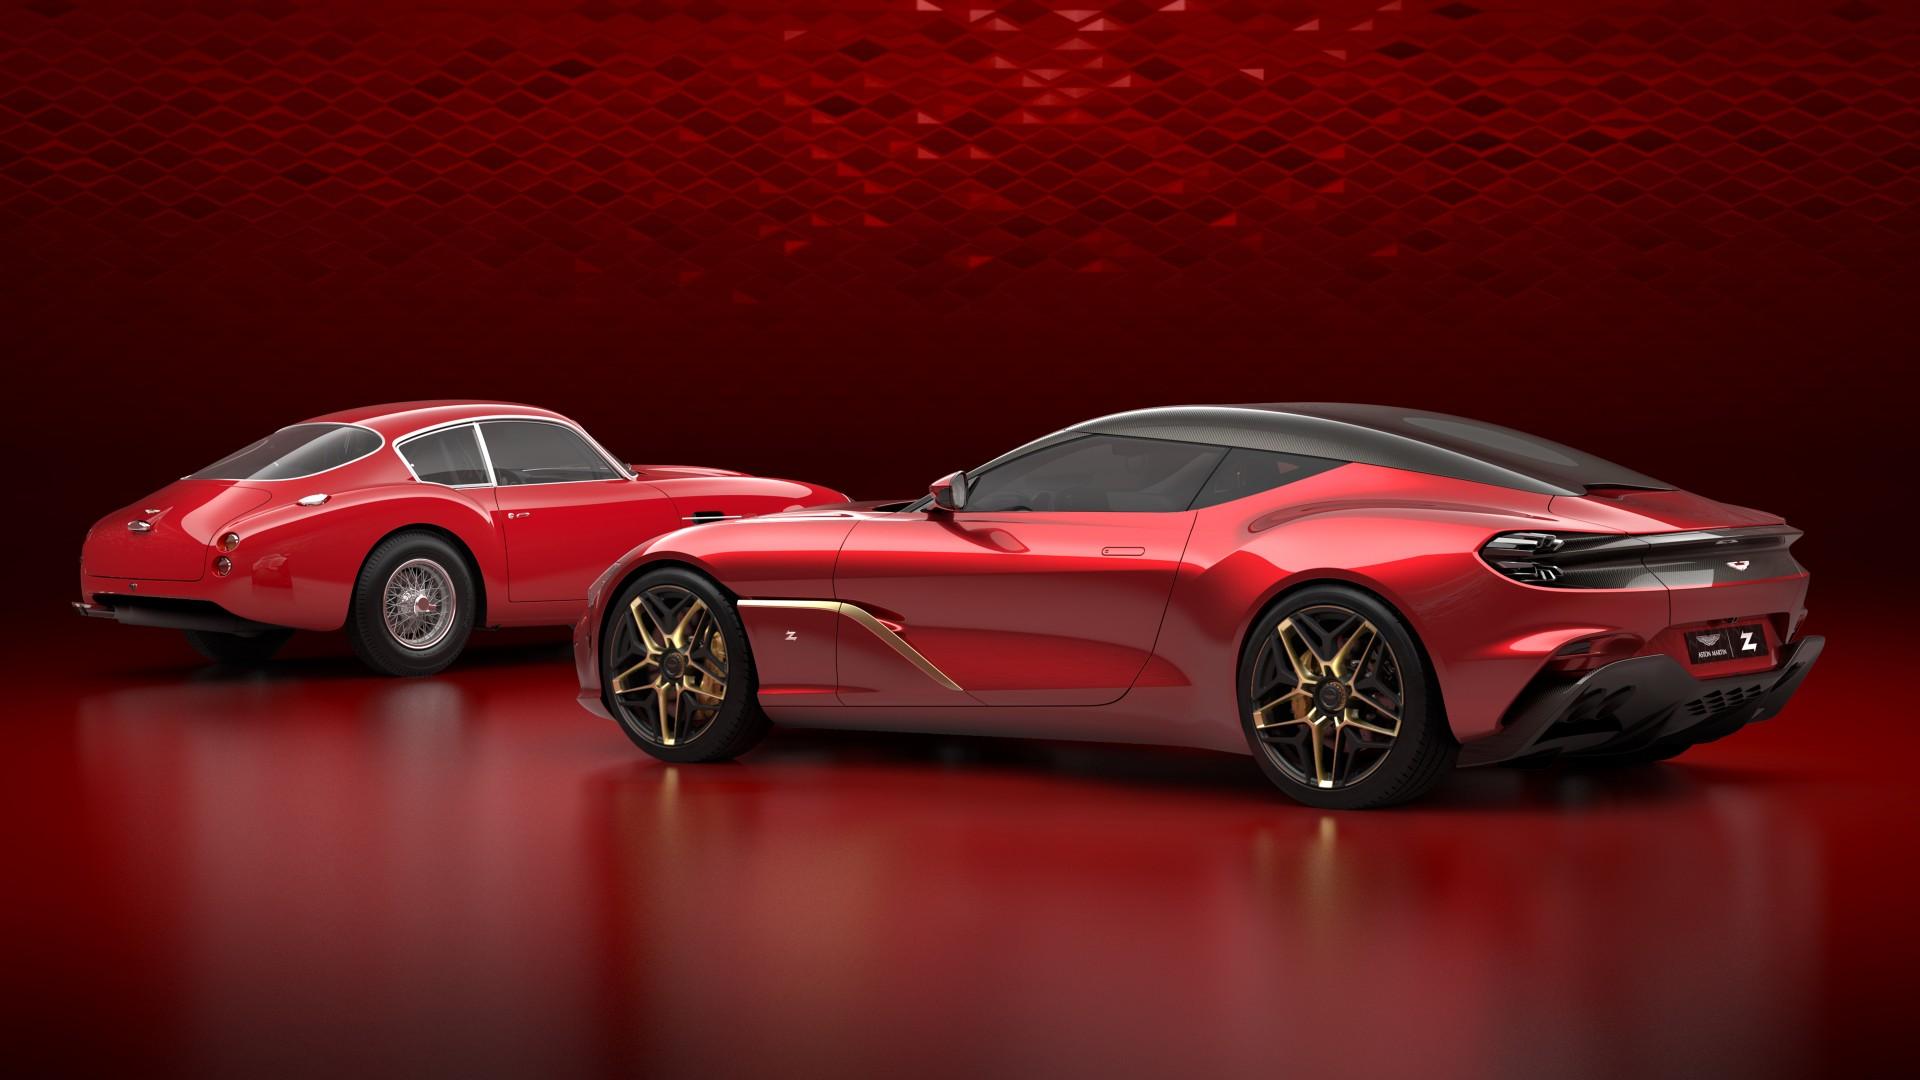 F1 Iphone Wallpaper Aston Martin Dbs Gt Zagato 2019 4k 2 Wallpaper Hd Car